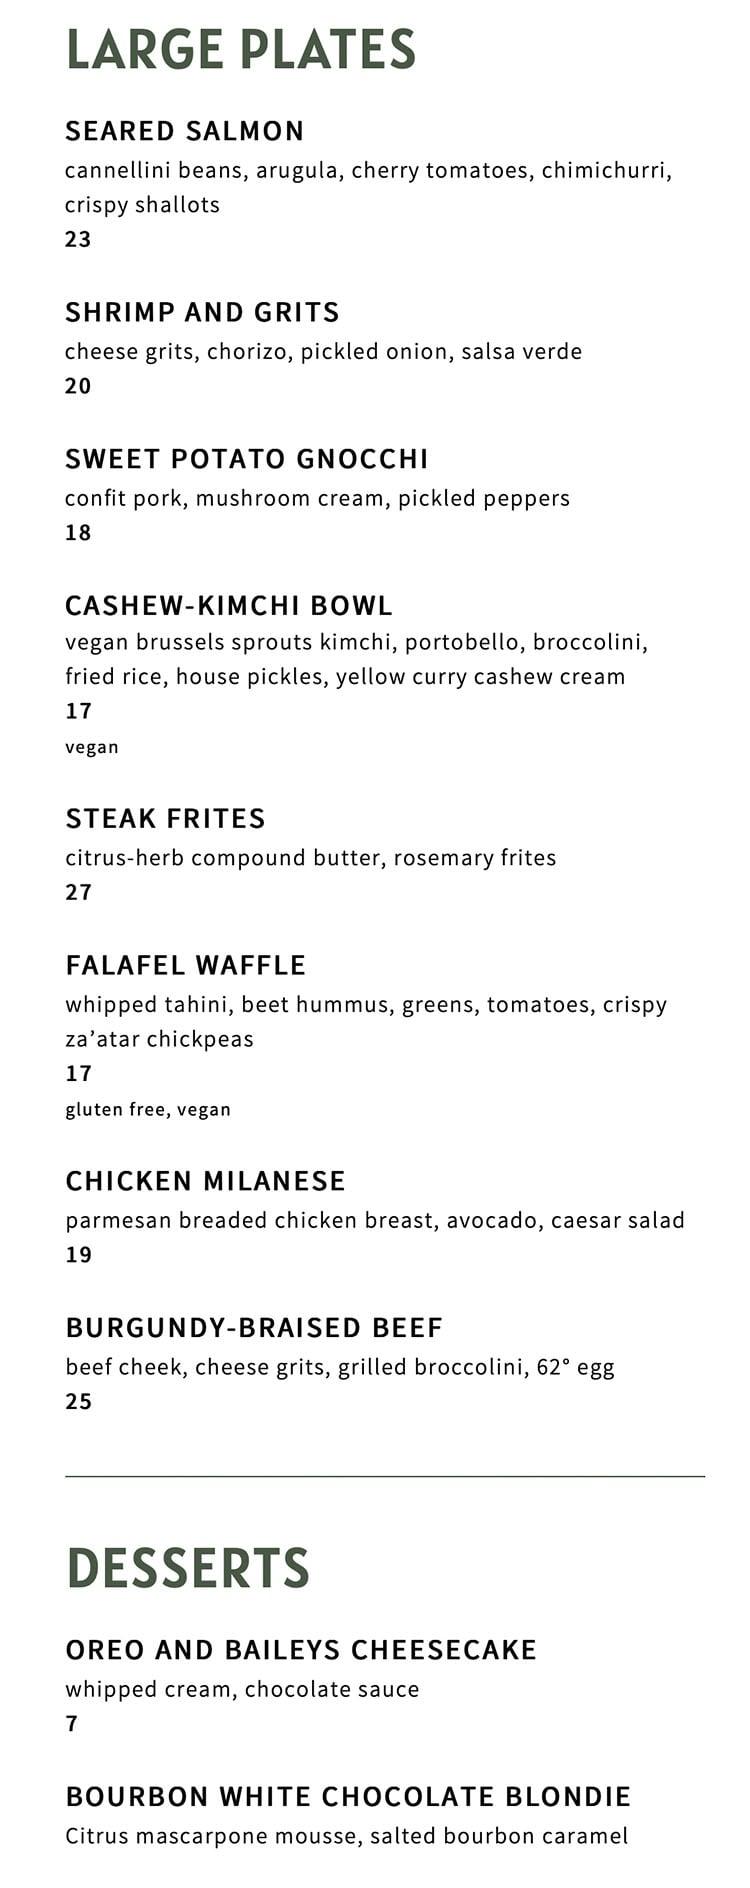 The Ivy menu - large plates, desserts